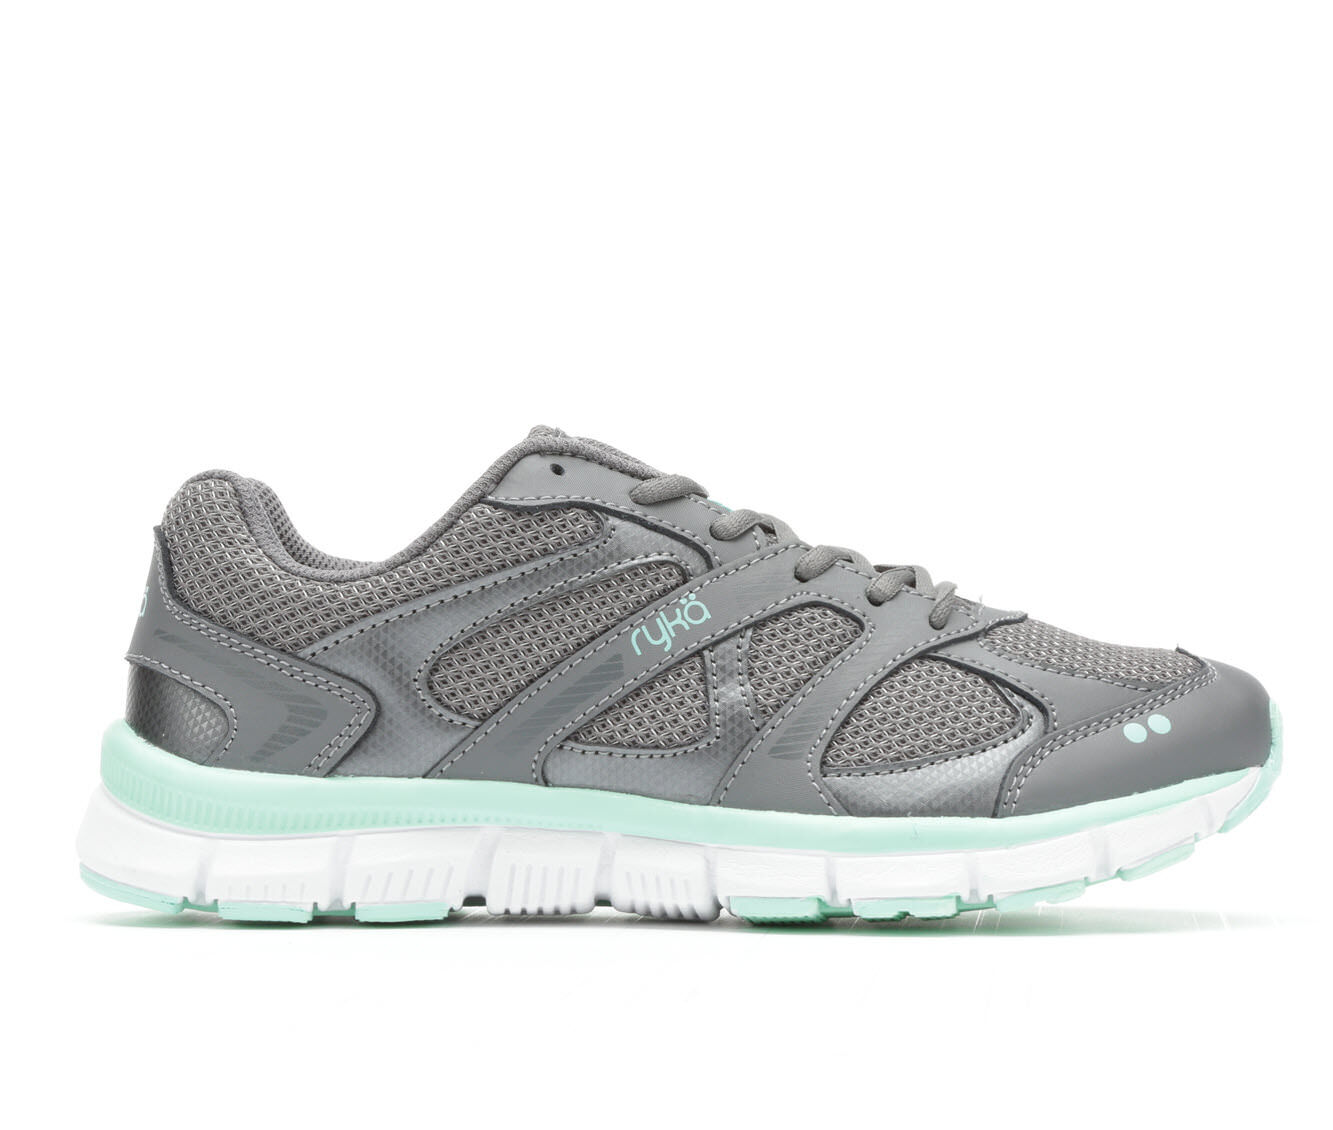 Women's Ryka Harmony Training Shoes footlocker cheap price uffPsWG4